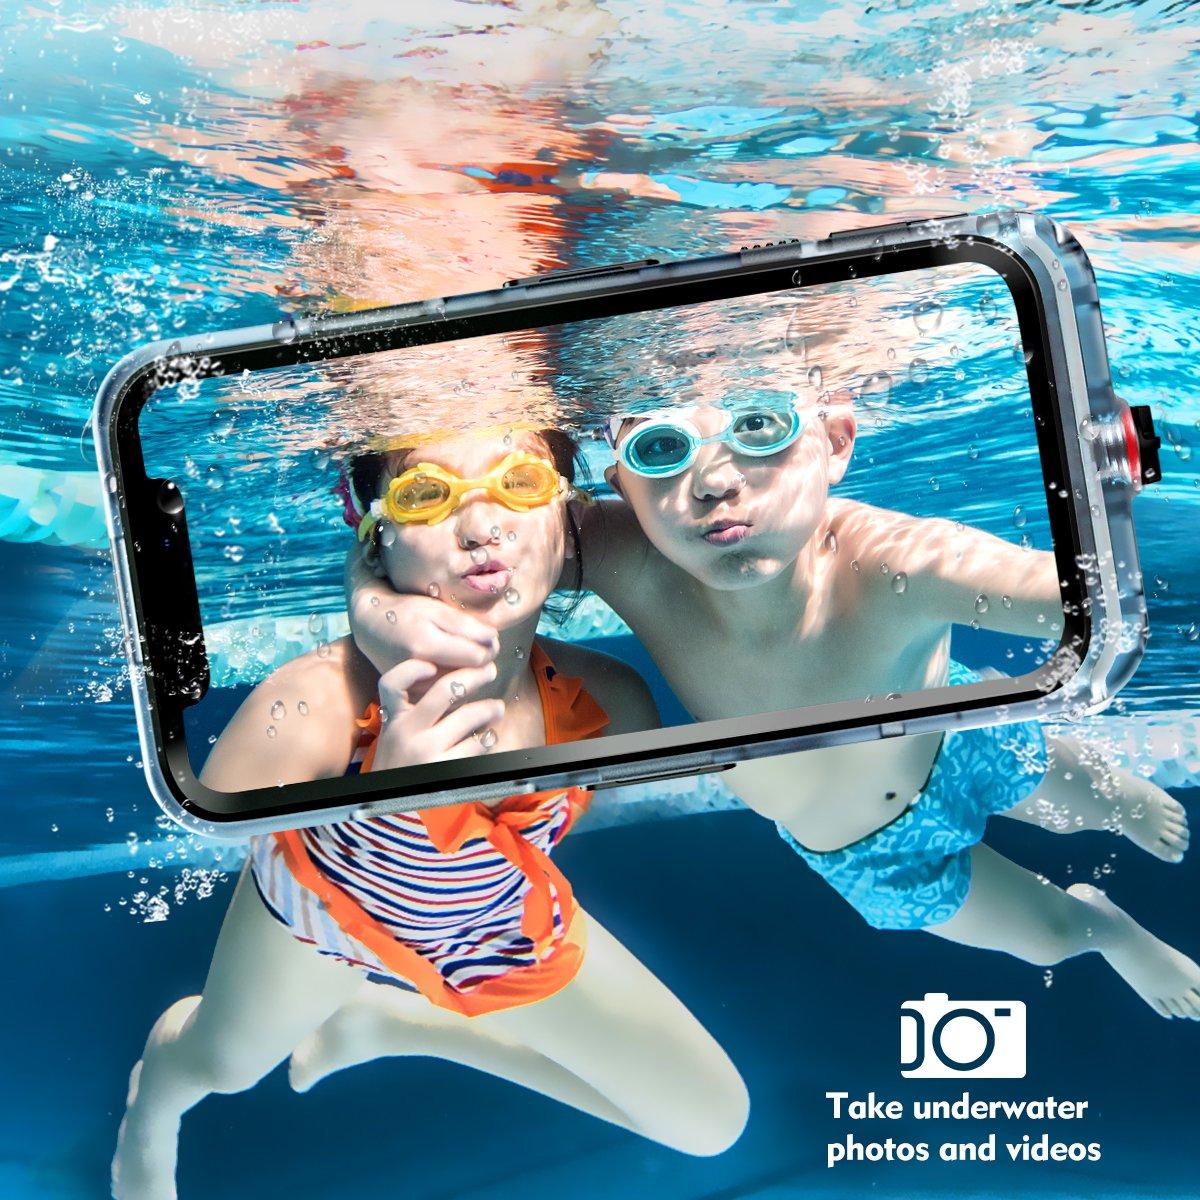 Cornmi iPhone X Waterproof Case, Full Sealed IP68 Certified Waterproof Shockproof Snowproof Protection Underwater Case for iPhone X 5.2inch (Black) by Cornmi (Image #7)